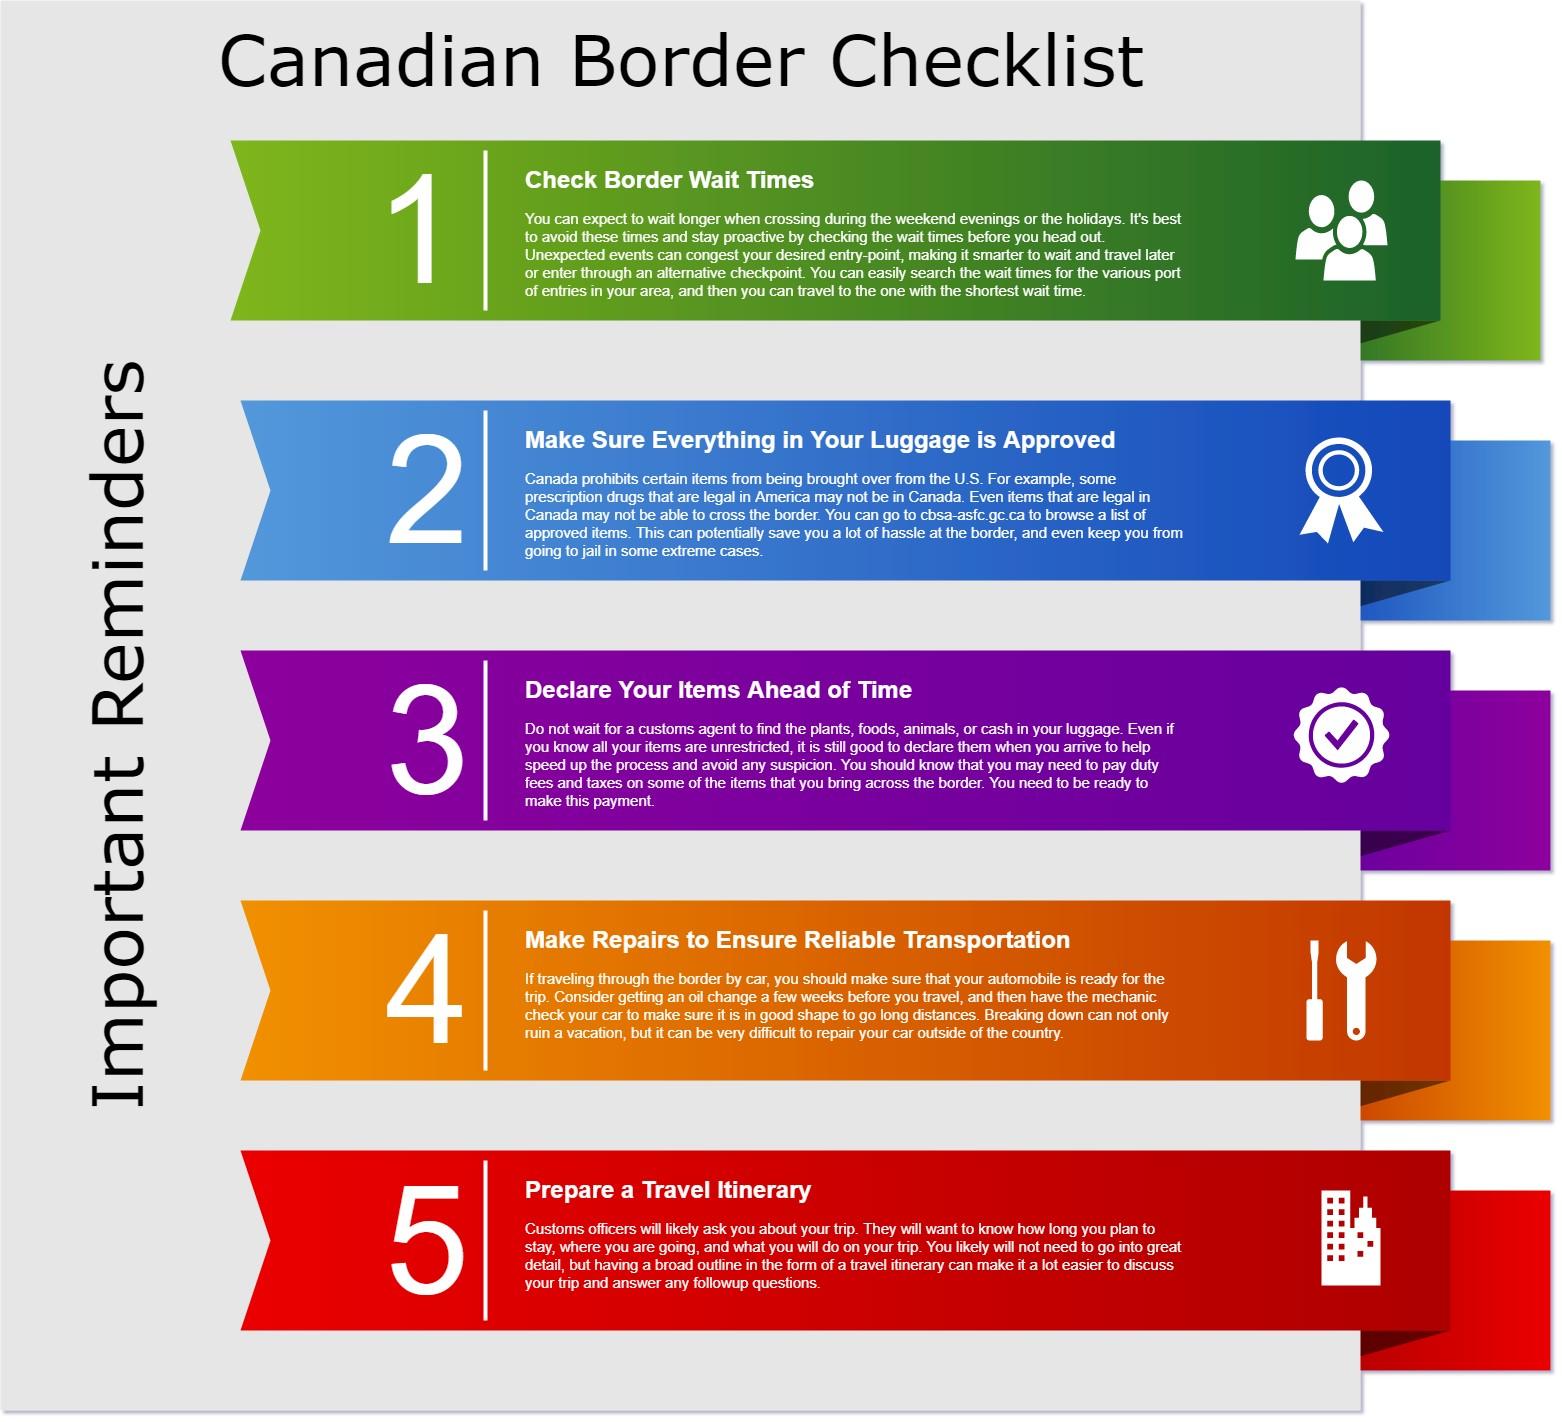 Canadian Border Checklist